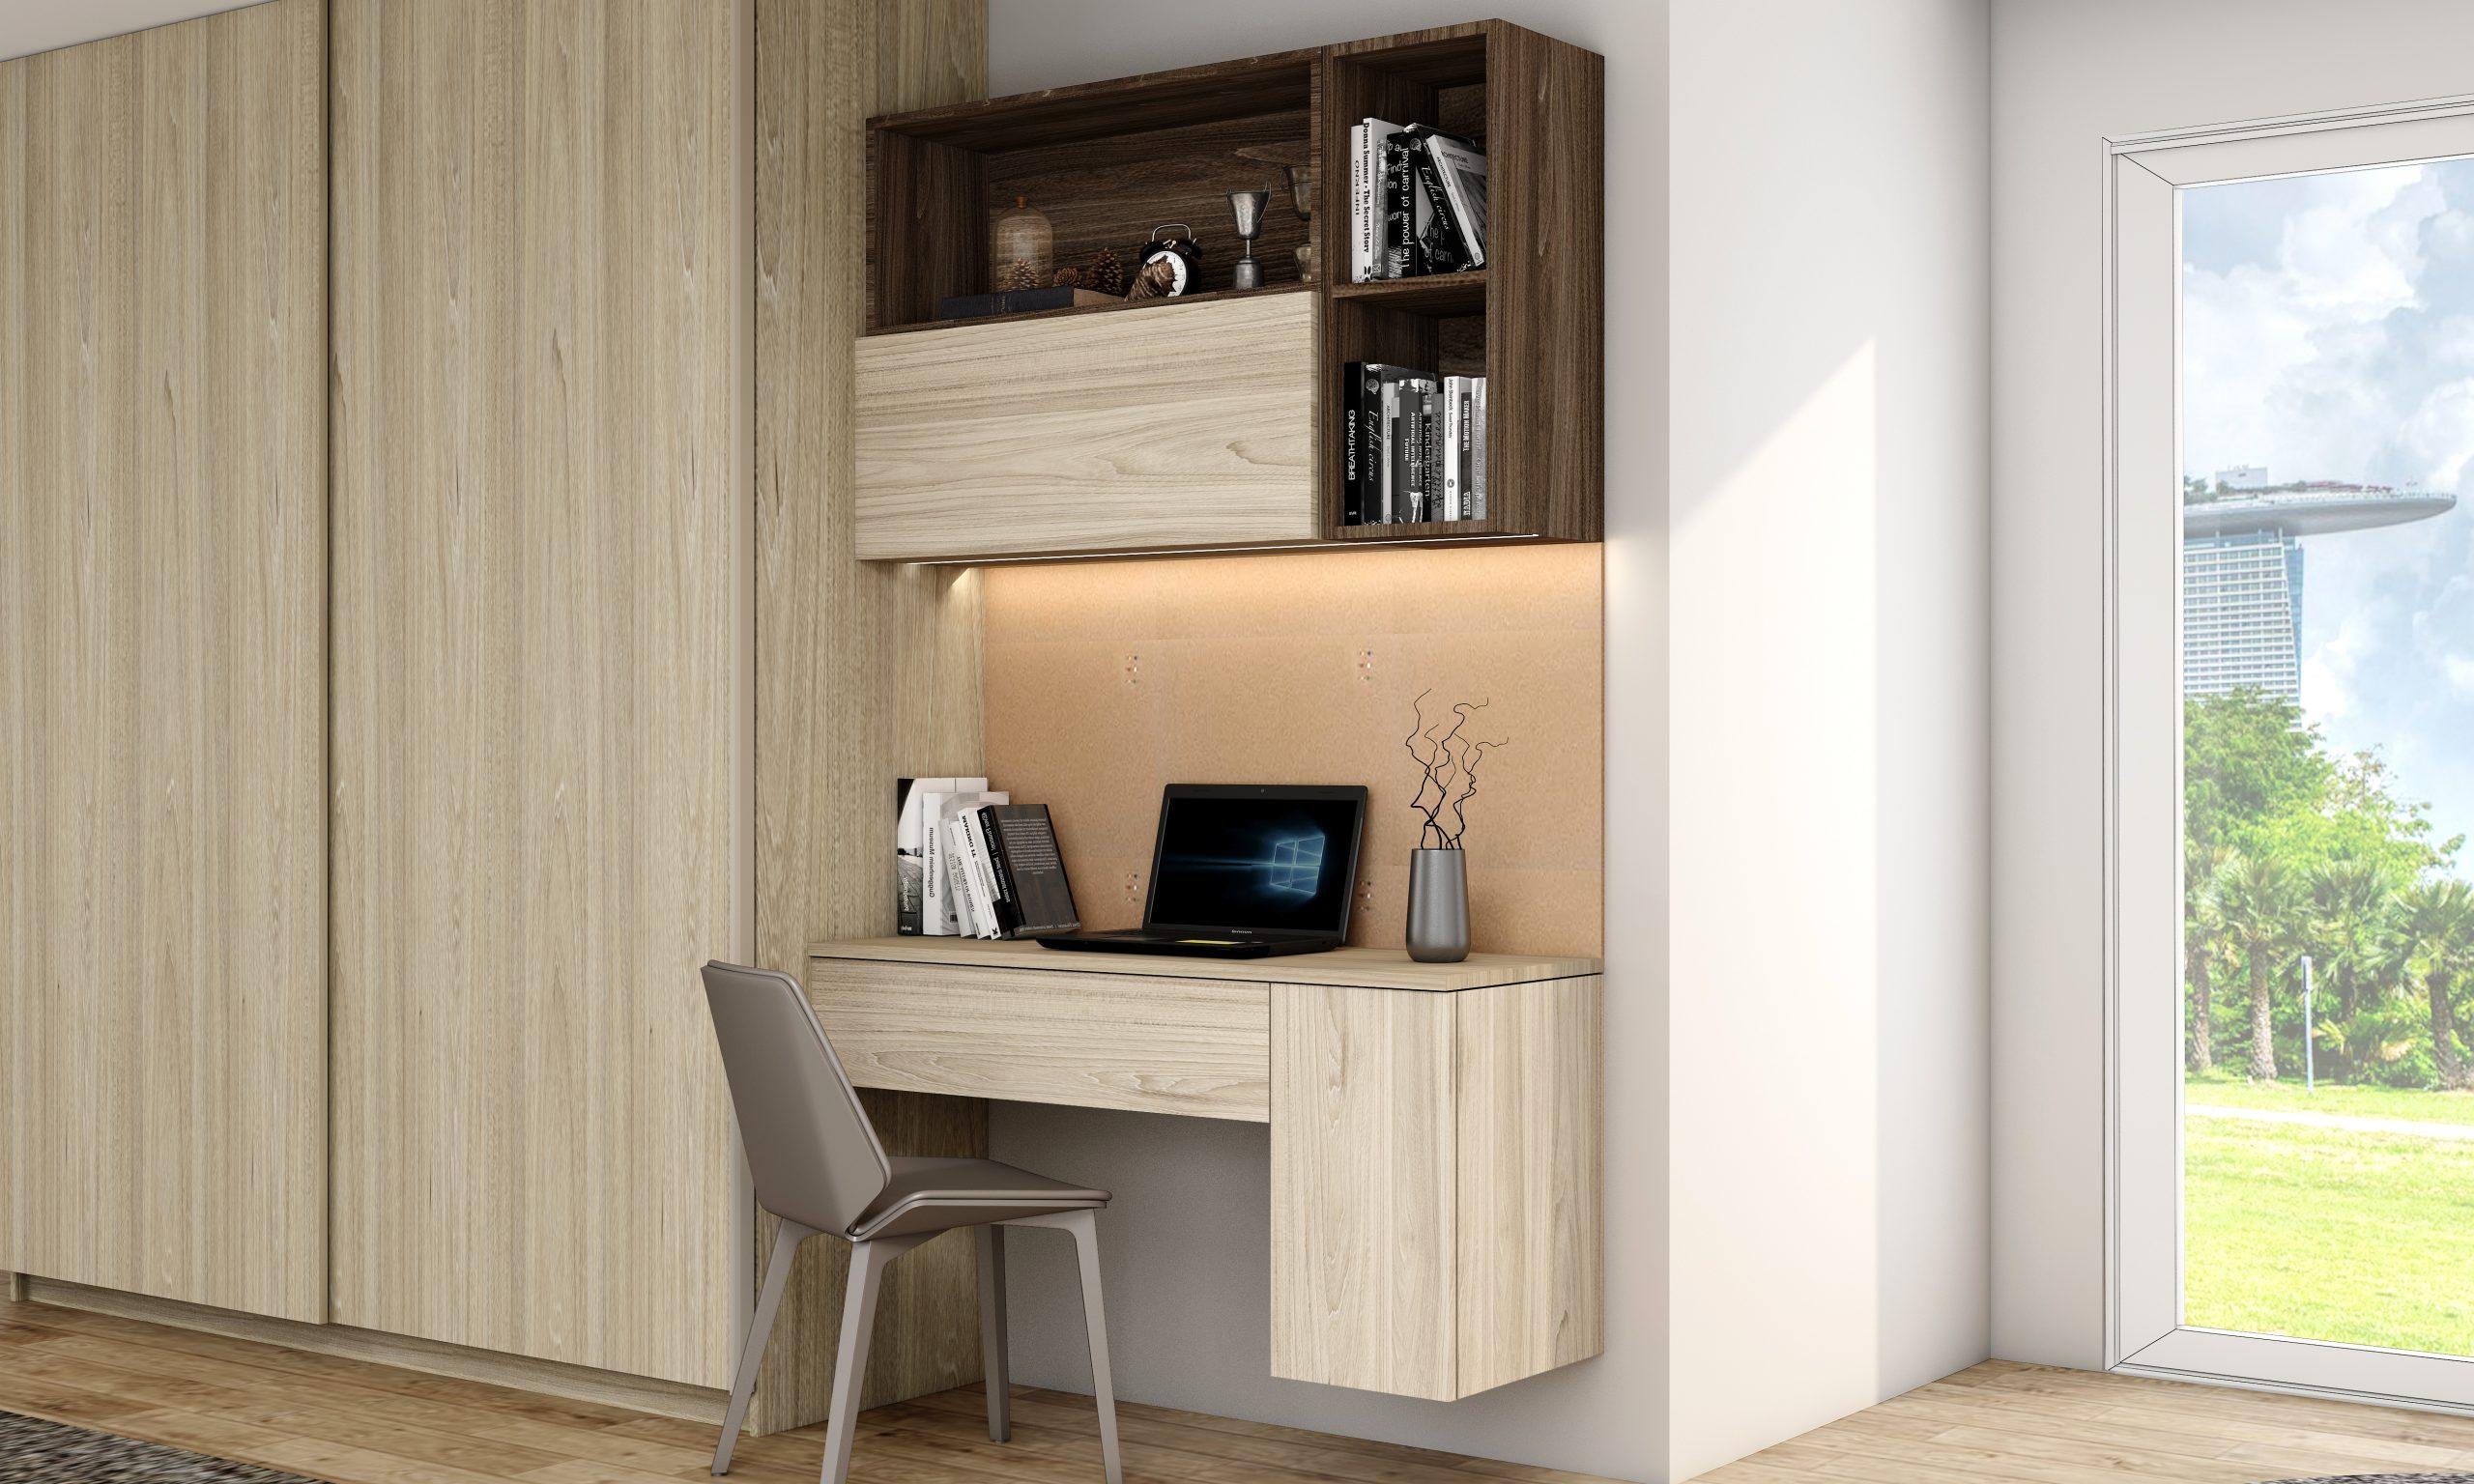 Sliding Wardrobe With Home Study Desk in Woodgrain Finish